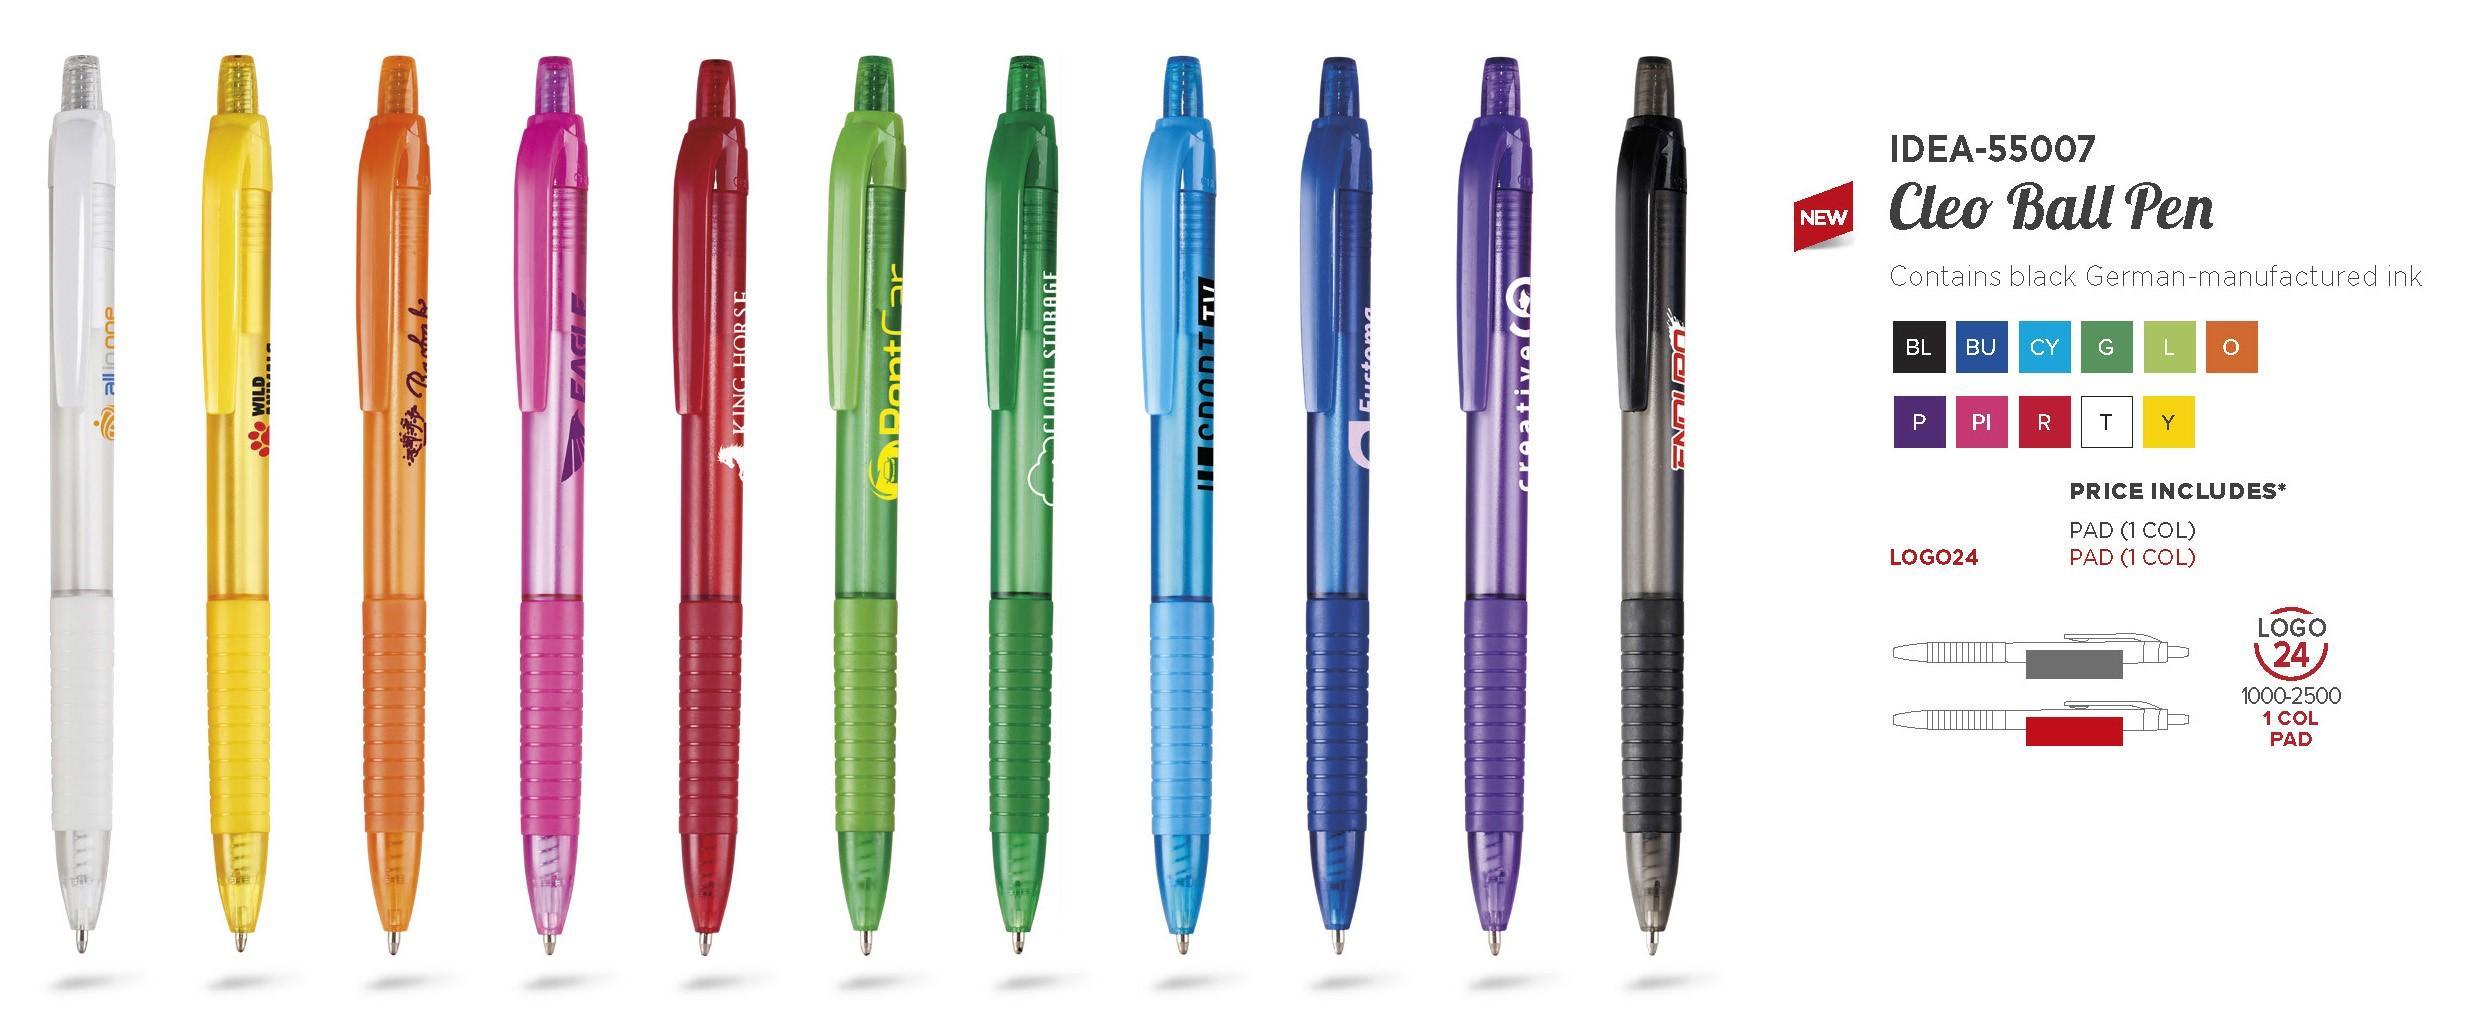 Cleo Ball Pen